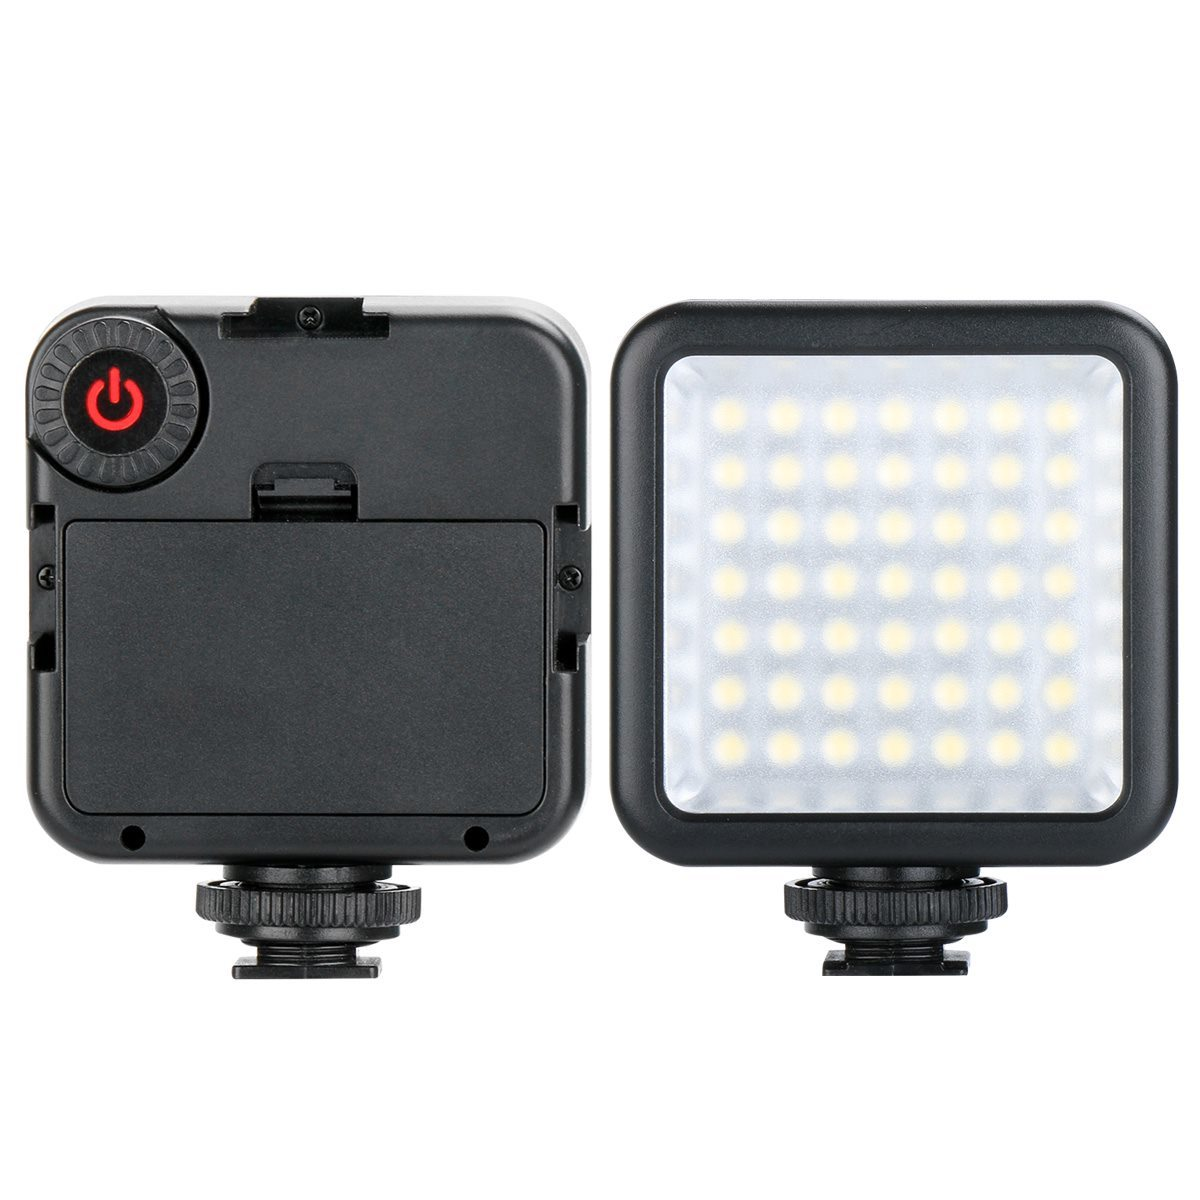 Zhiyun аксессуары Свет фонарь W49 LED для стабилизаторов Zhiyun Smooth 4 и DJI Osmo Mobile 2 свет_w49_2.jpg